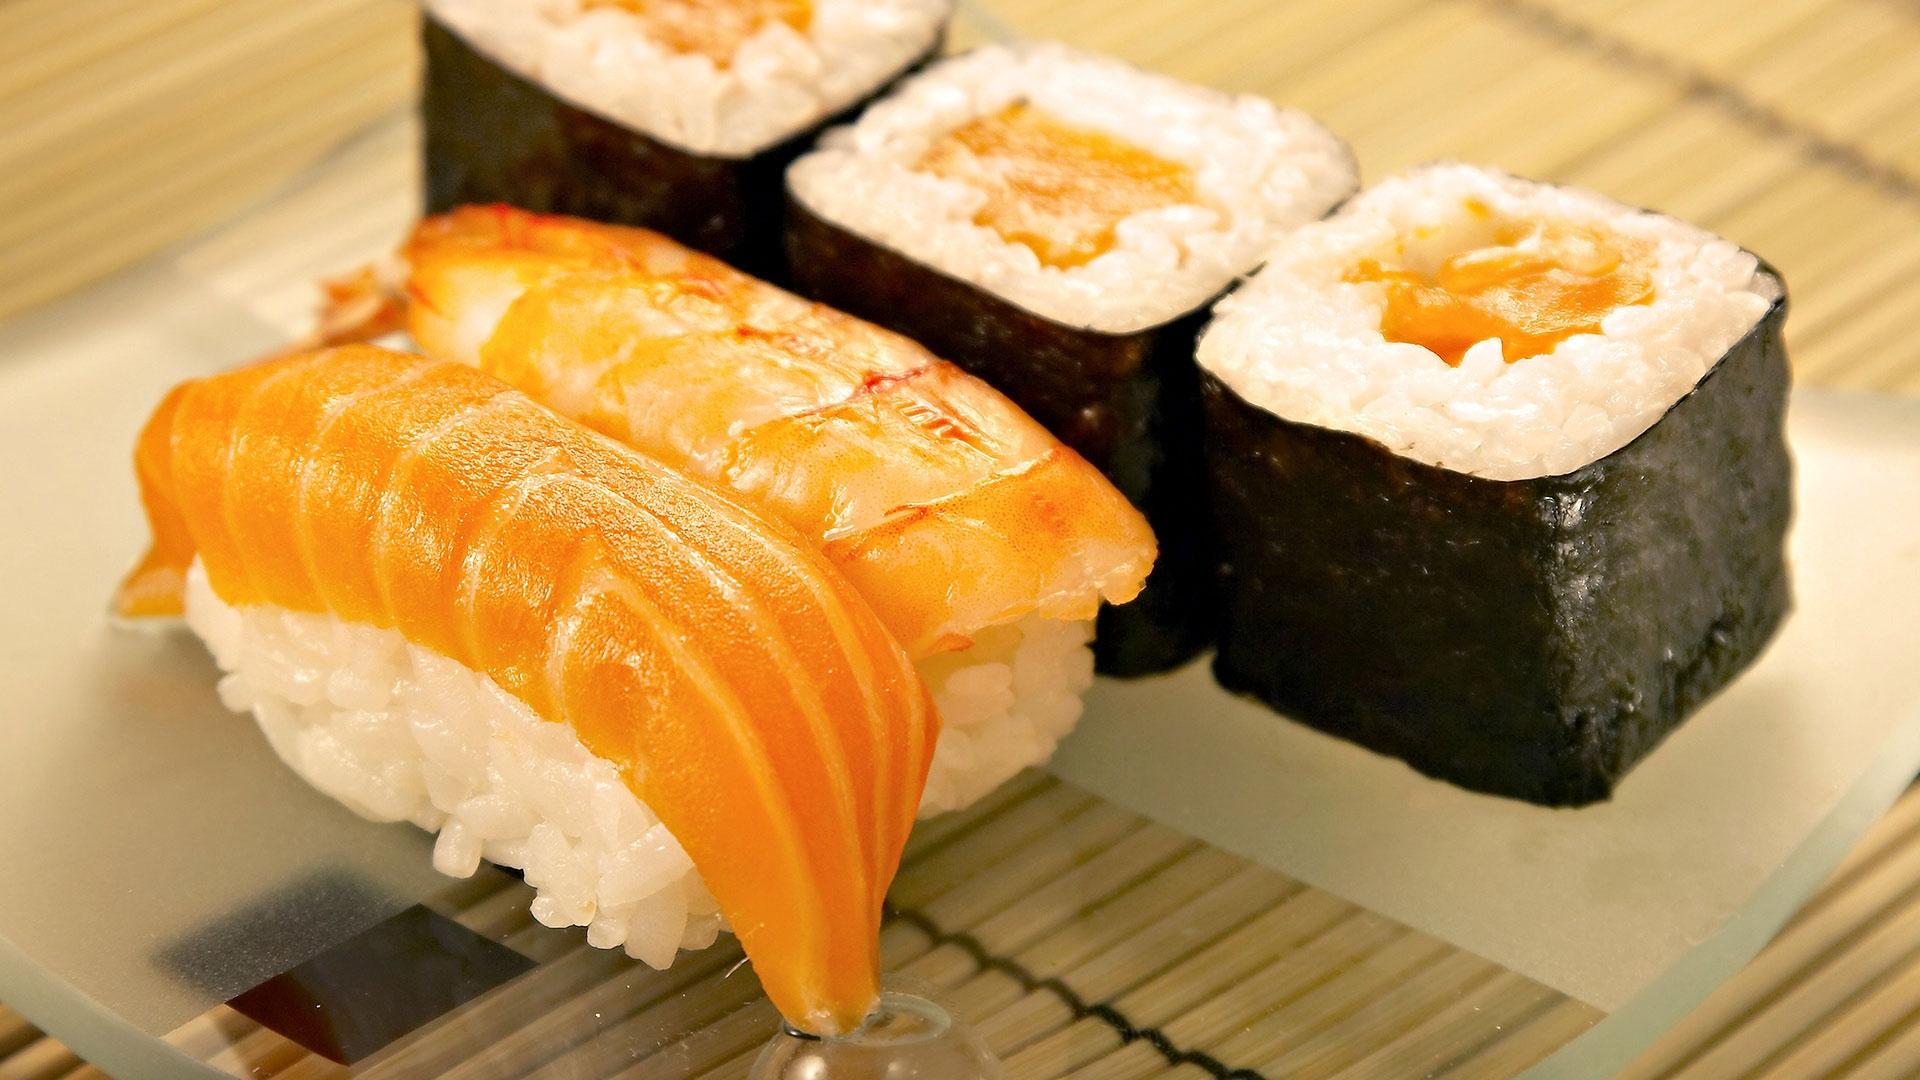 Download Wallpaper 1920x1080 sushi, fish, algas Full HD ...